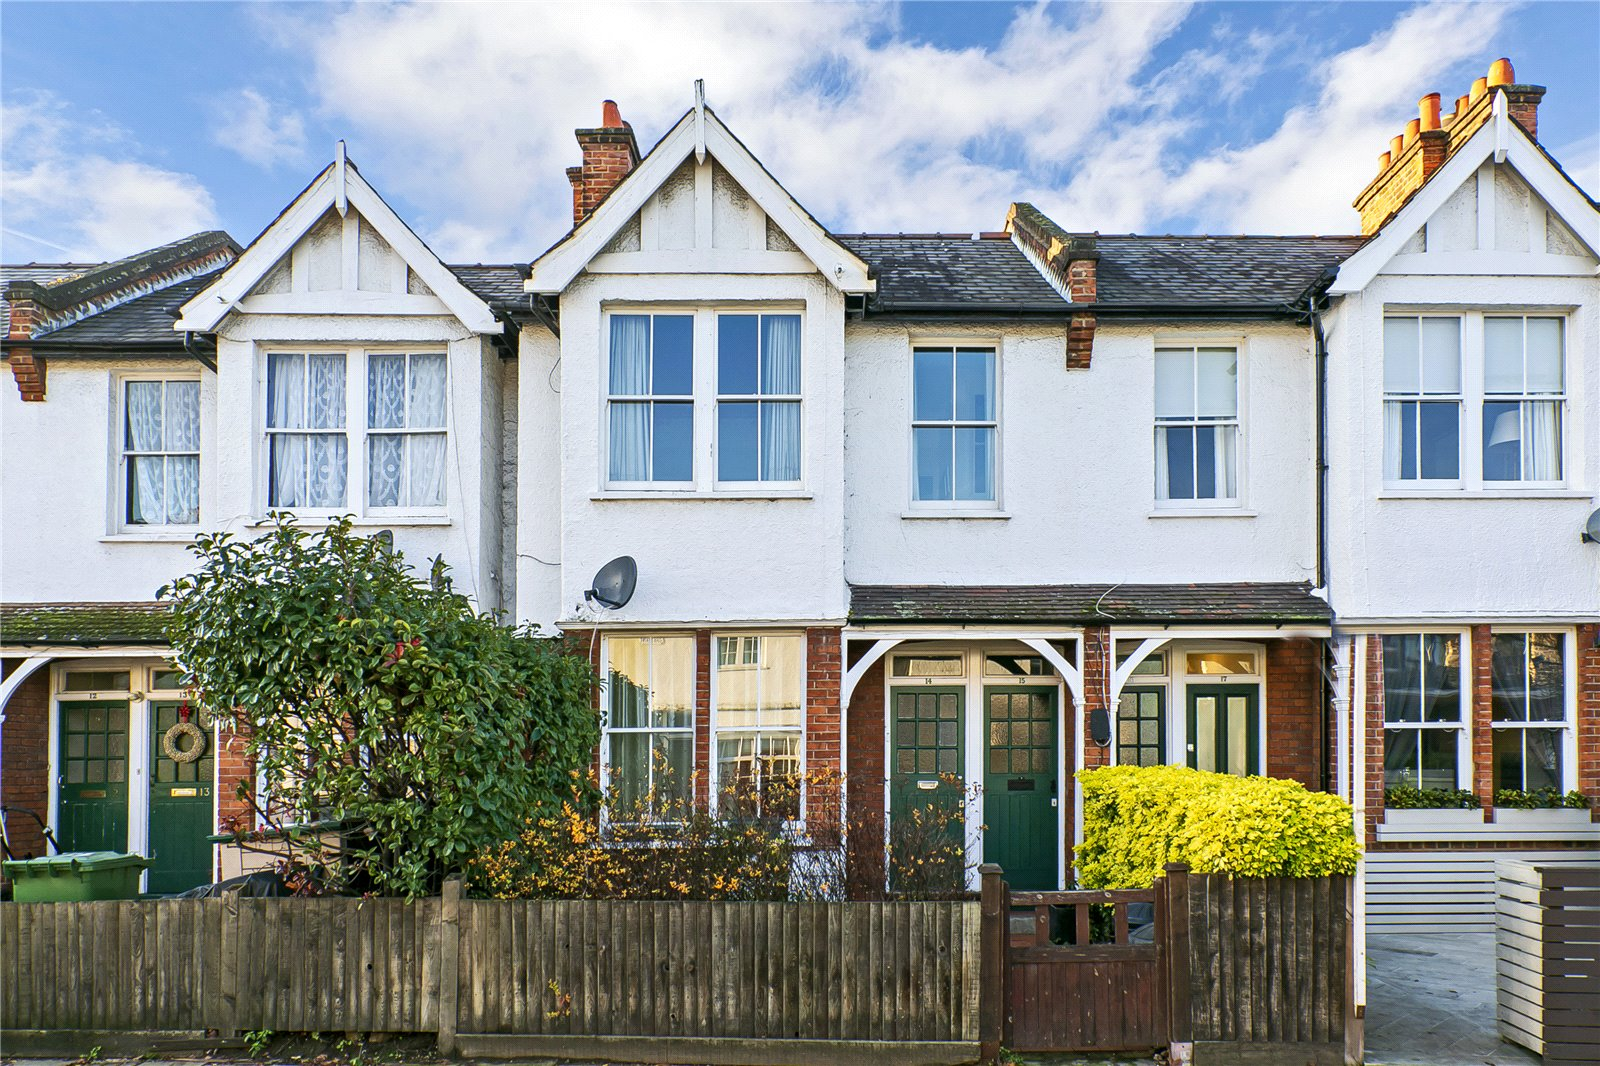 Dover Terrace, Sandycombe Road, TW9 2EF - Antony Roberts